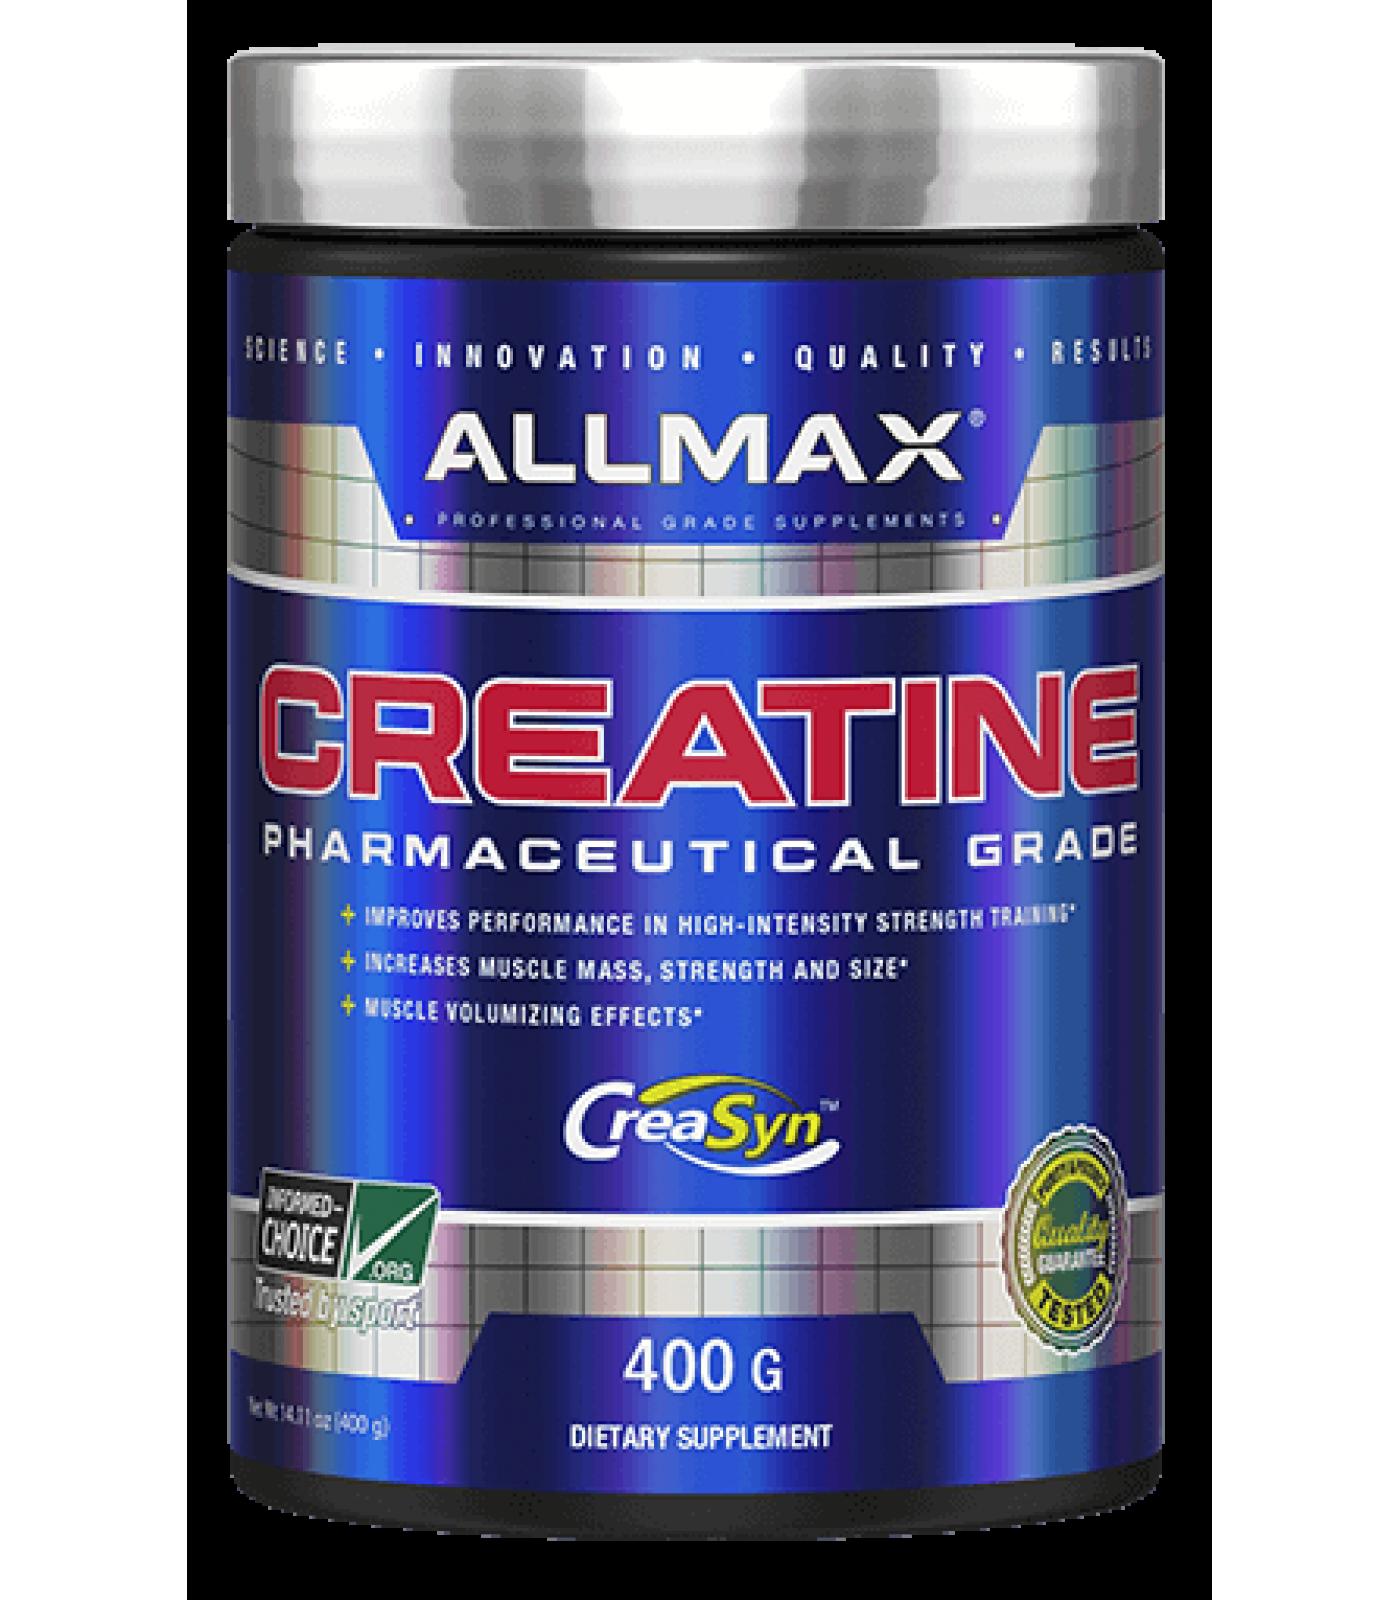 AllMax - Creatine Creasyn / 400gr.